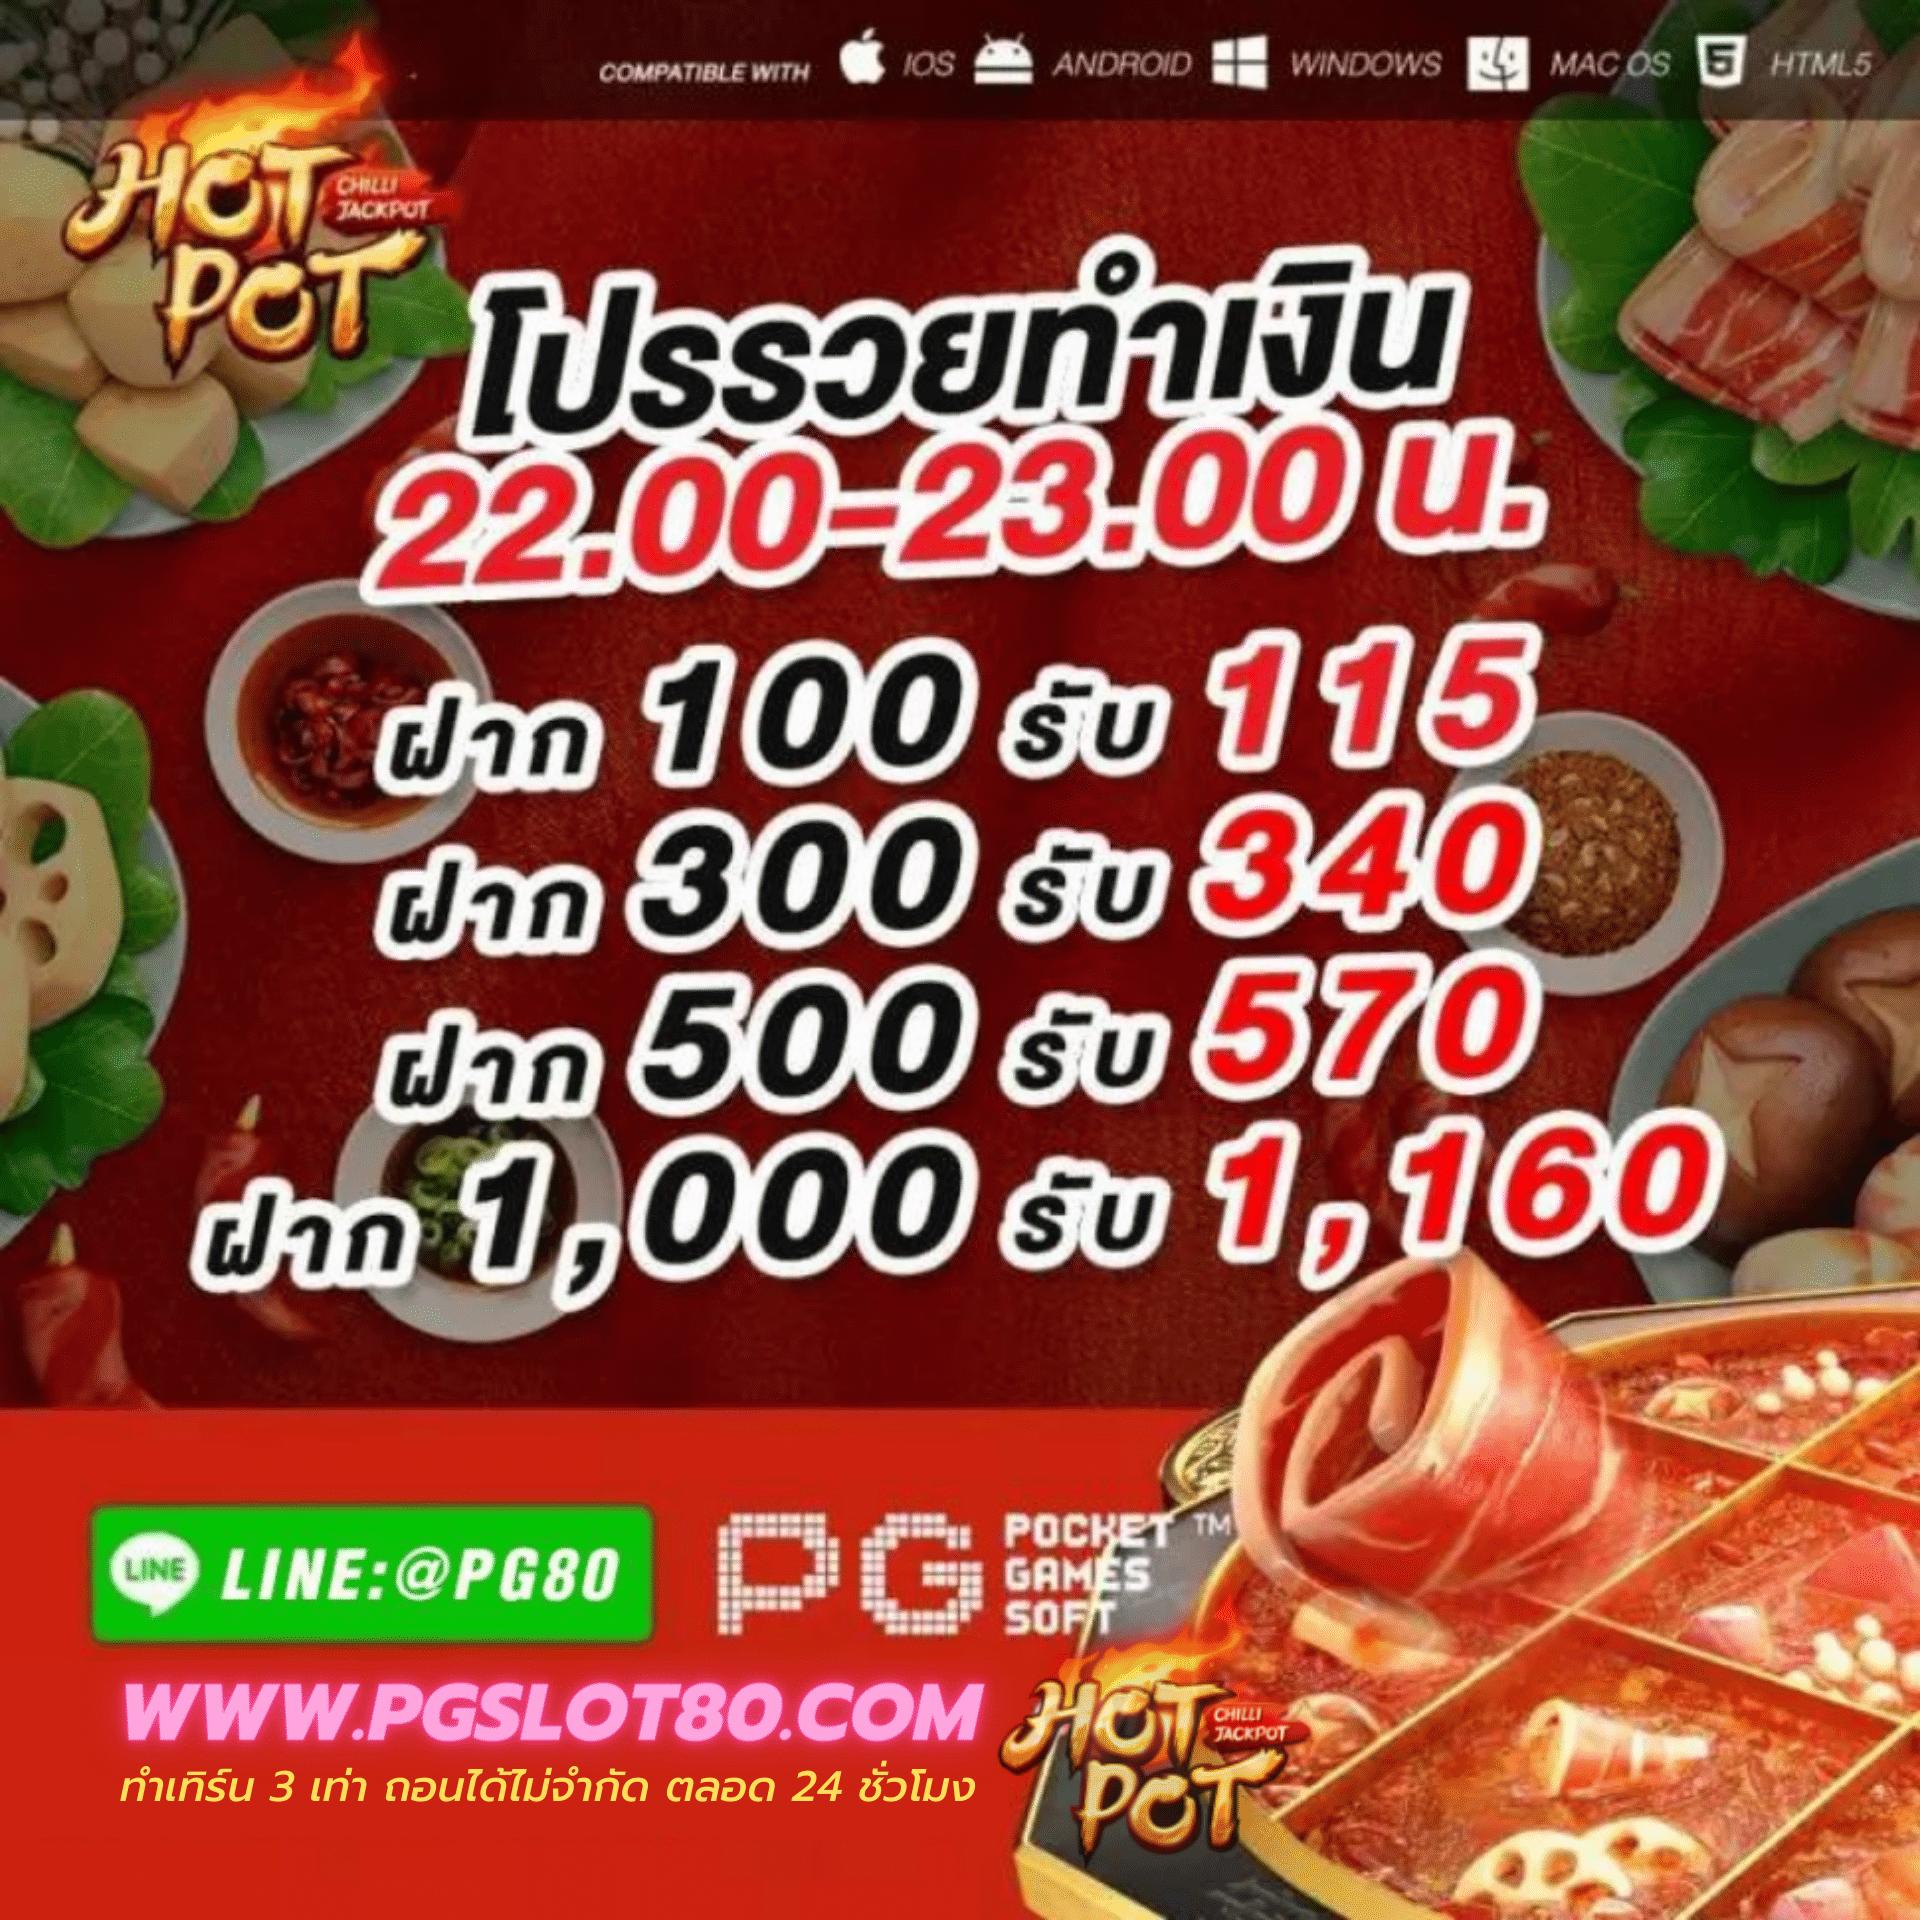 pg slot โปรโมชั่น100%